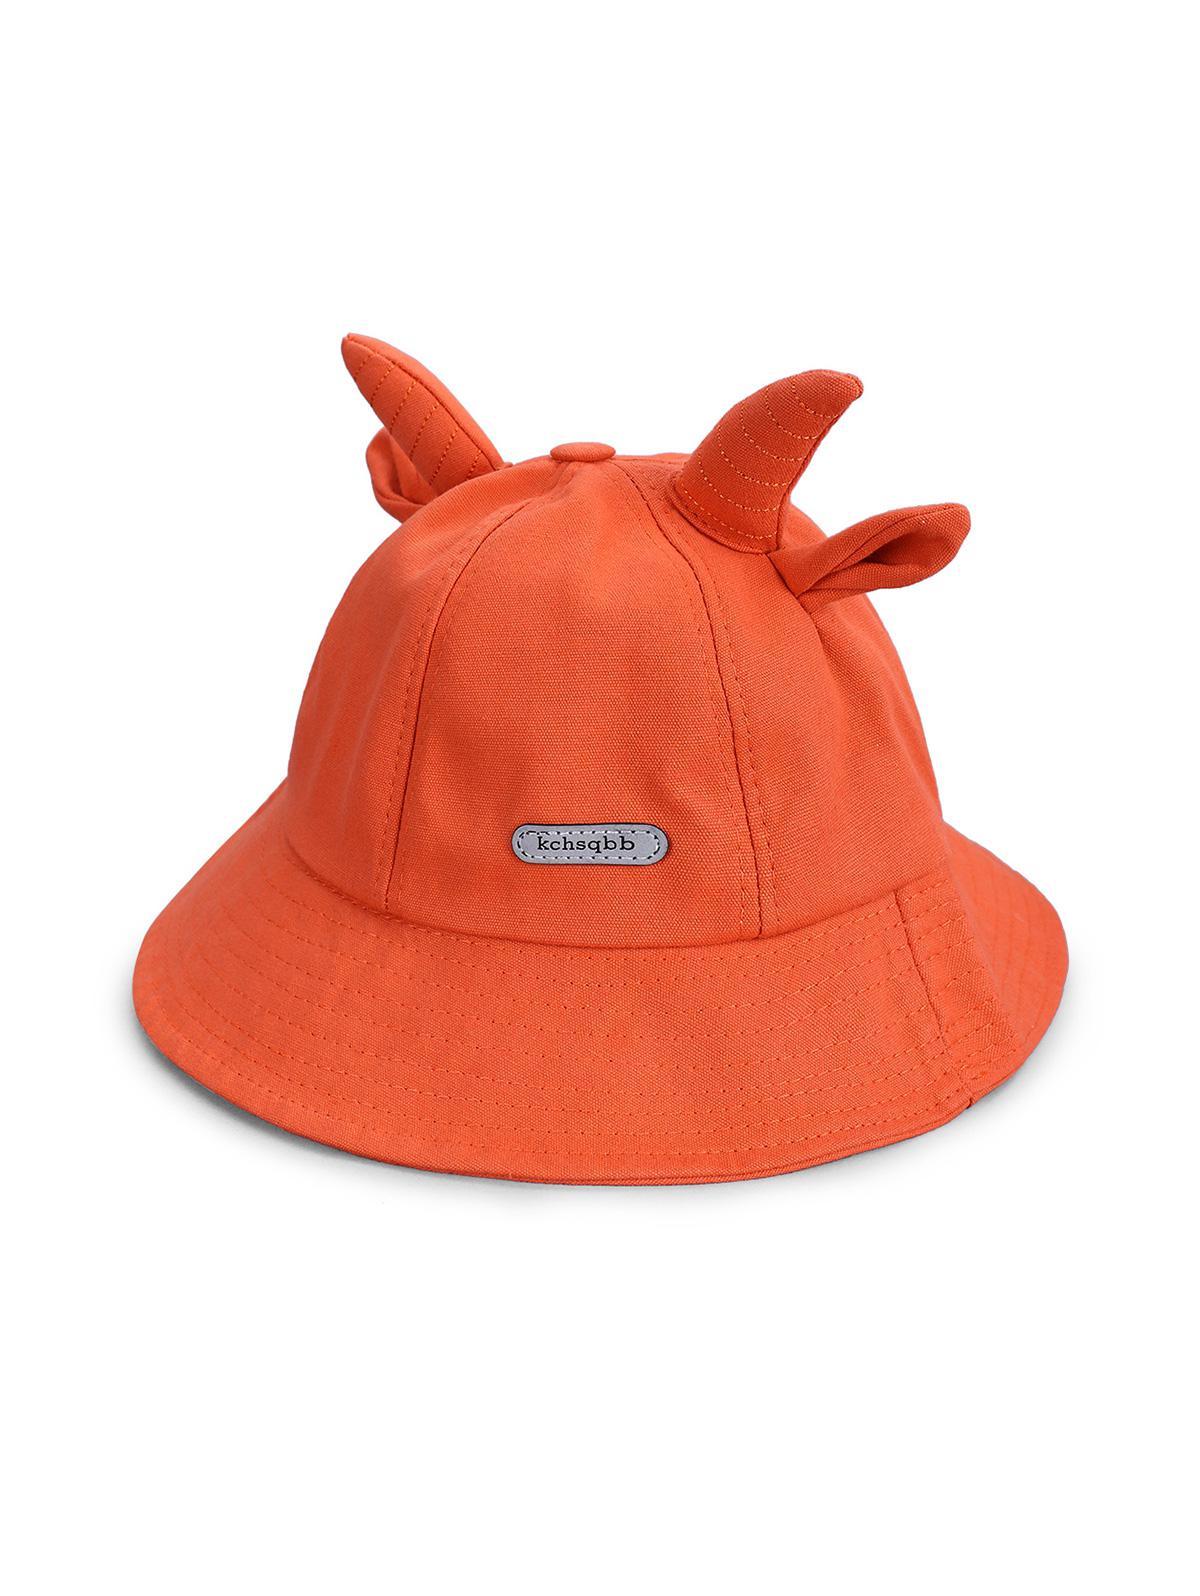 Cute Animal Ear Bucket Hats